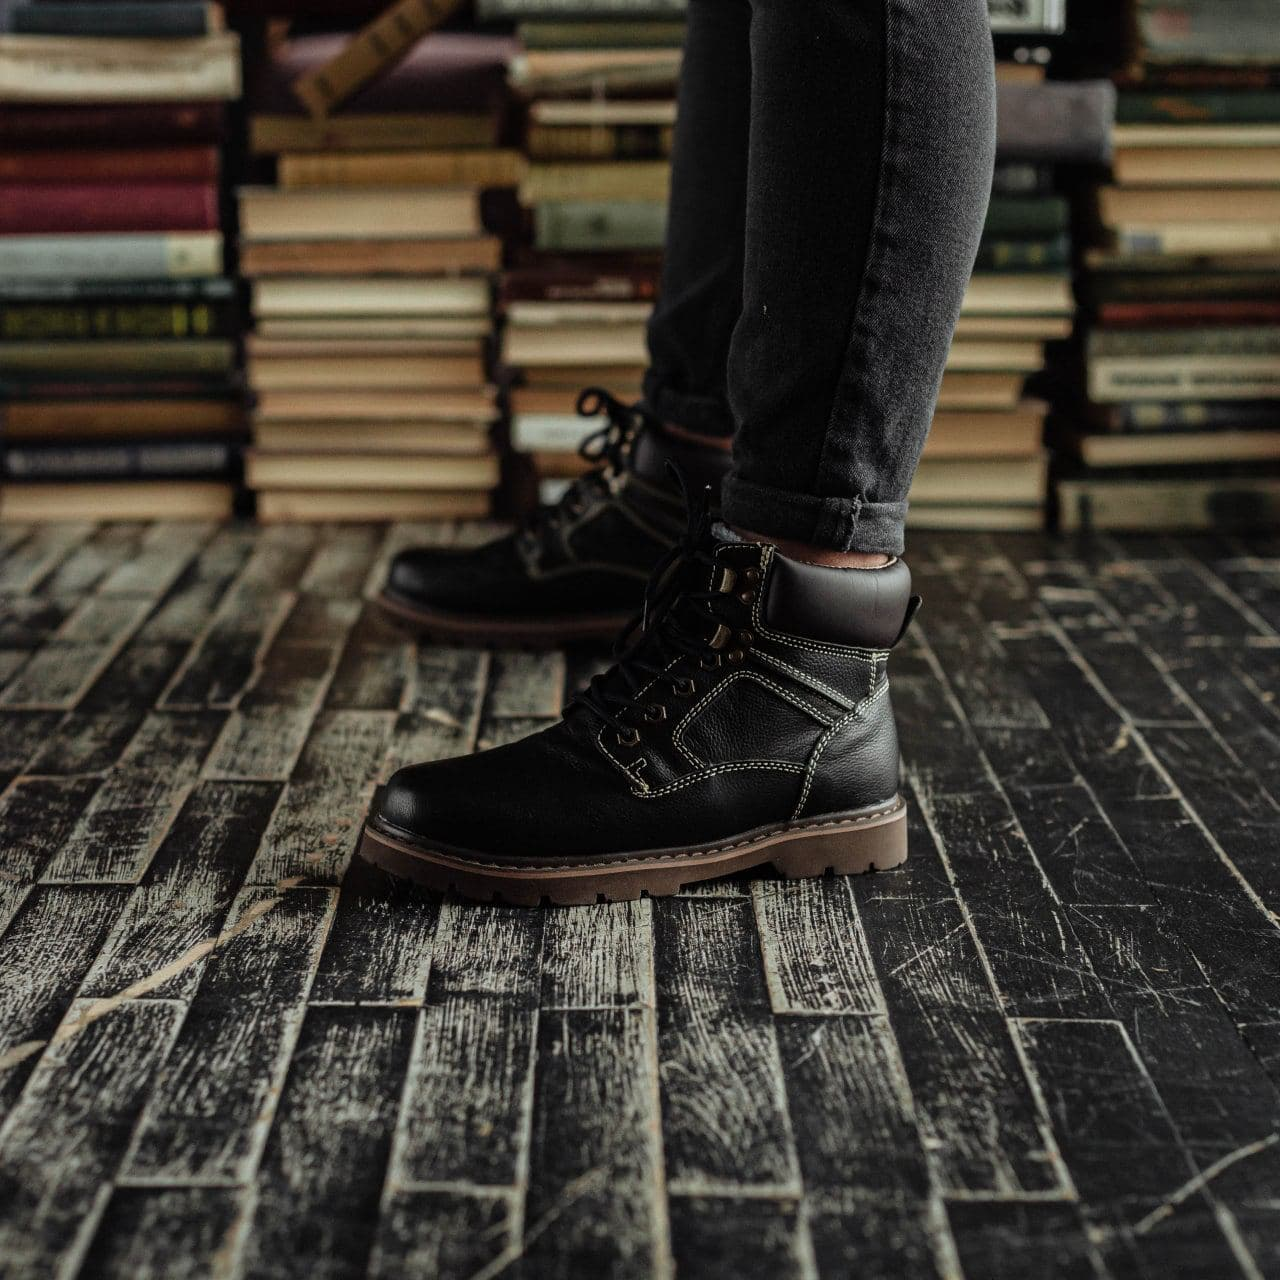 Ботинки South Graft black - фото 2